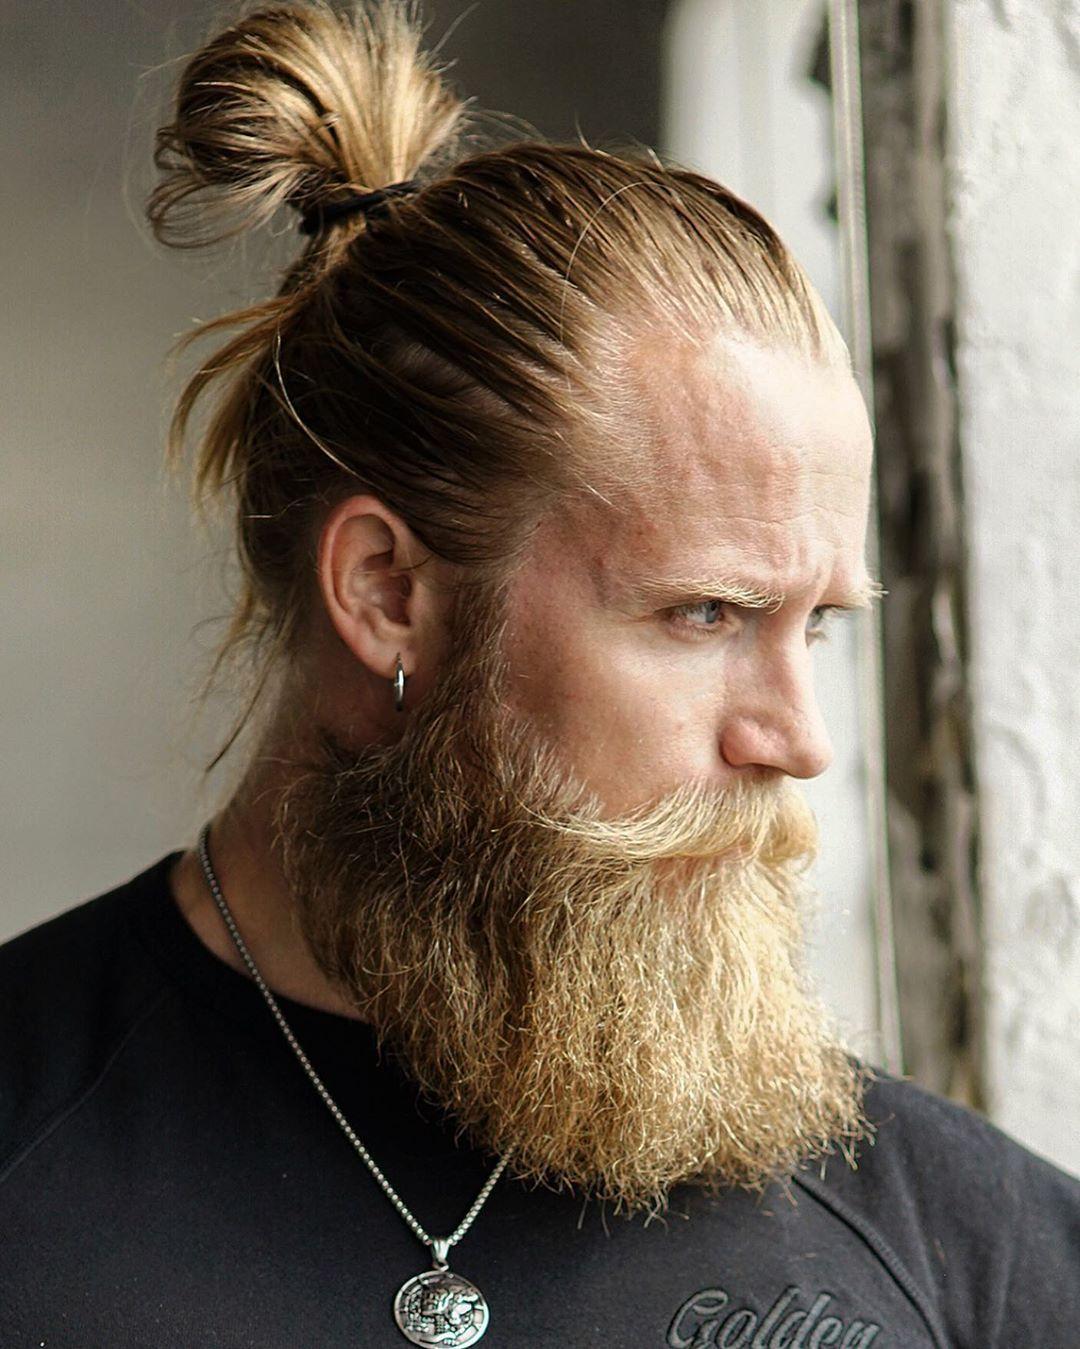 The Best Adam Levine Haircuts & Hairstyles (2020 Update ... |Haircut Beard Adam Levine